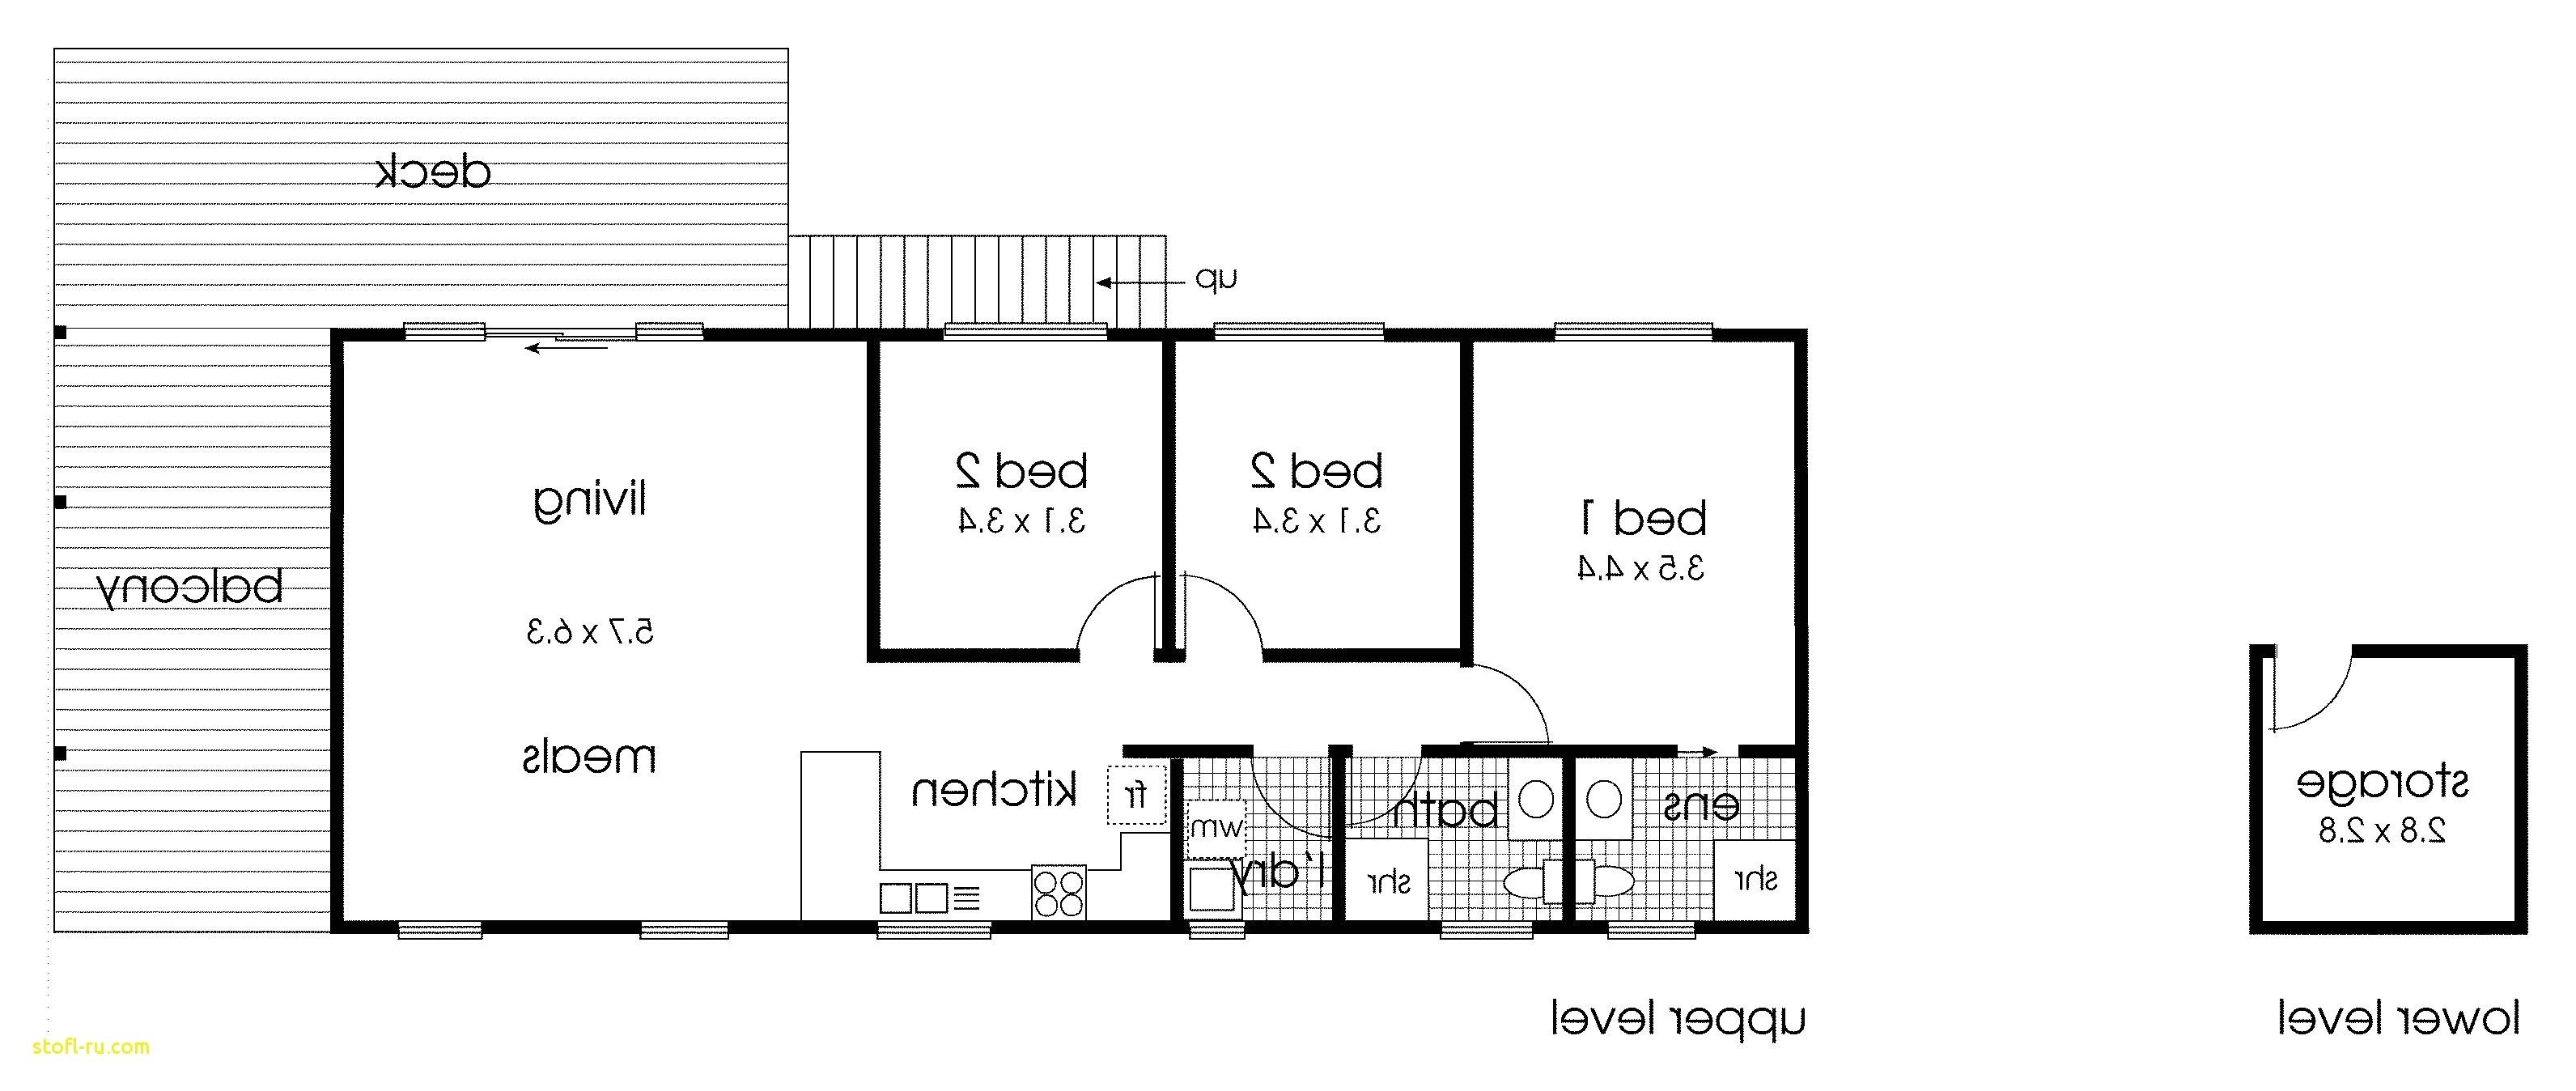 design floor plans fresh home plans 0d archives home house floor